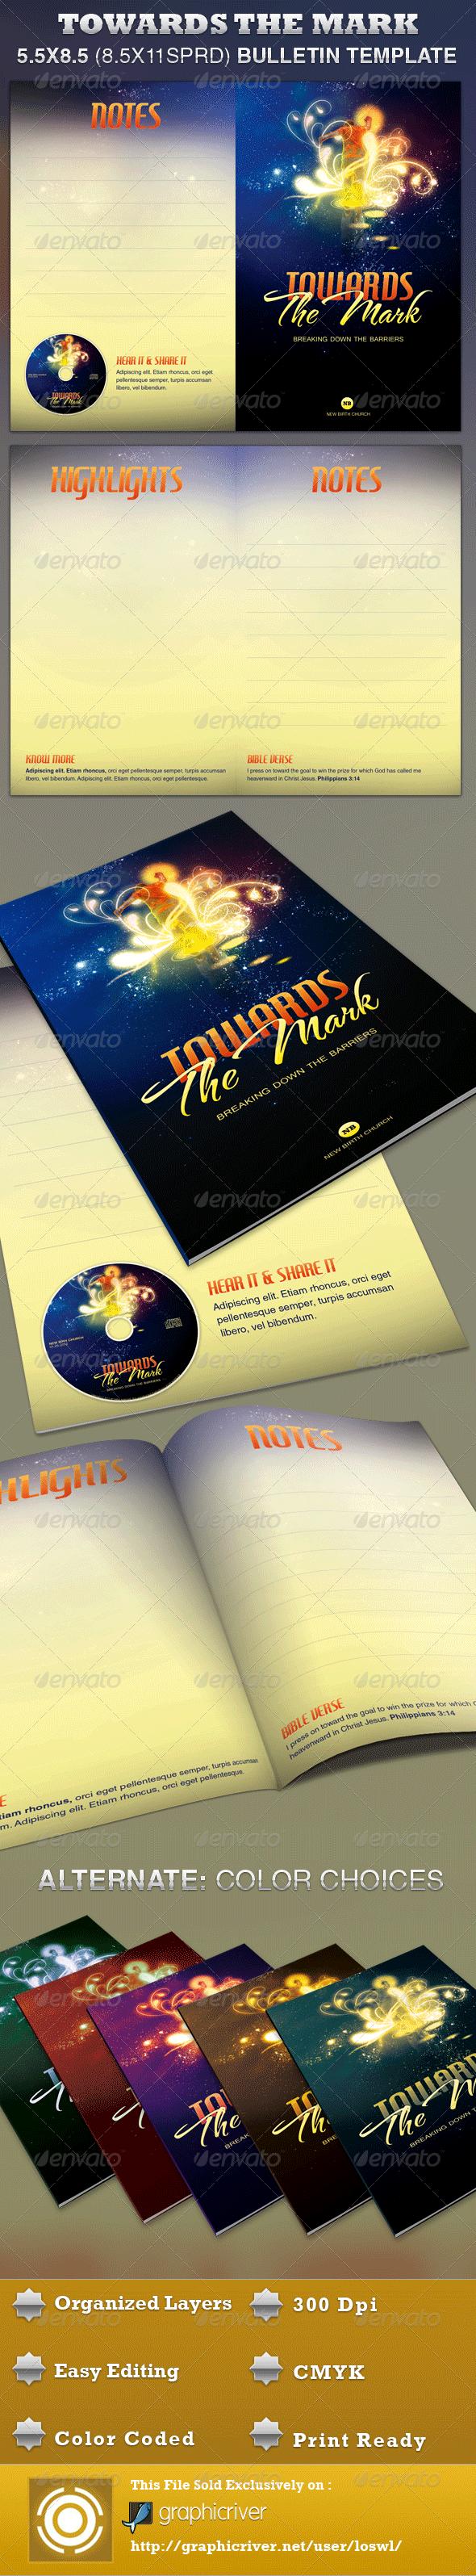 Towards the Mark Church Bulletin Template - Informational Brochures